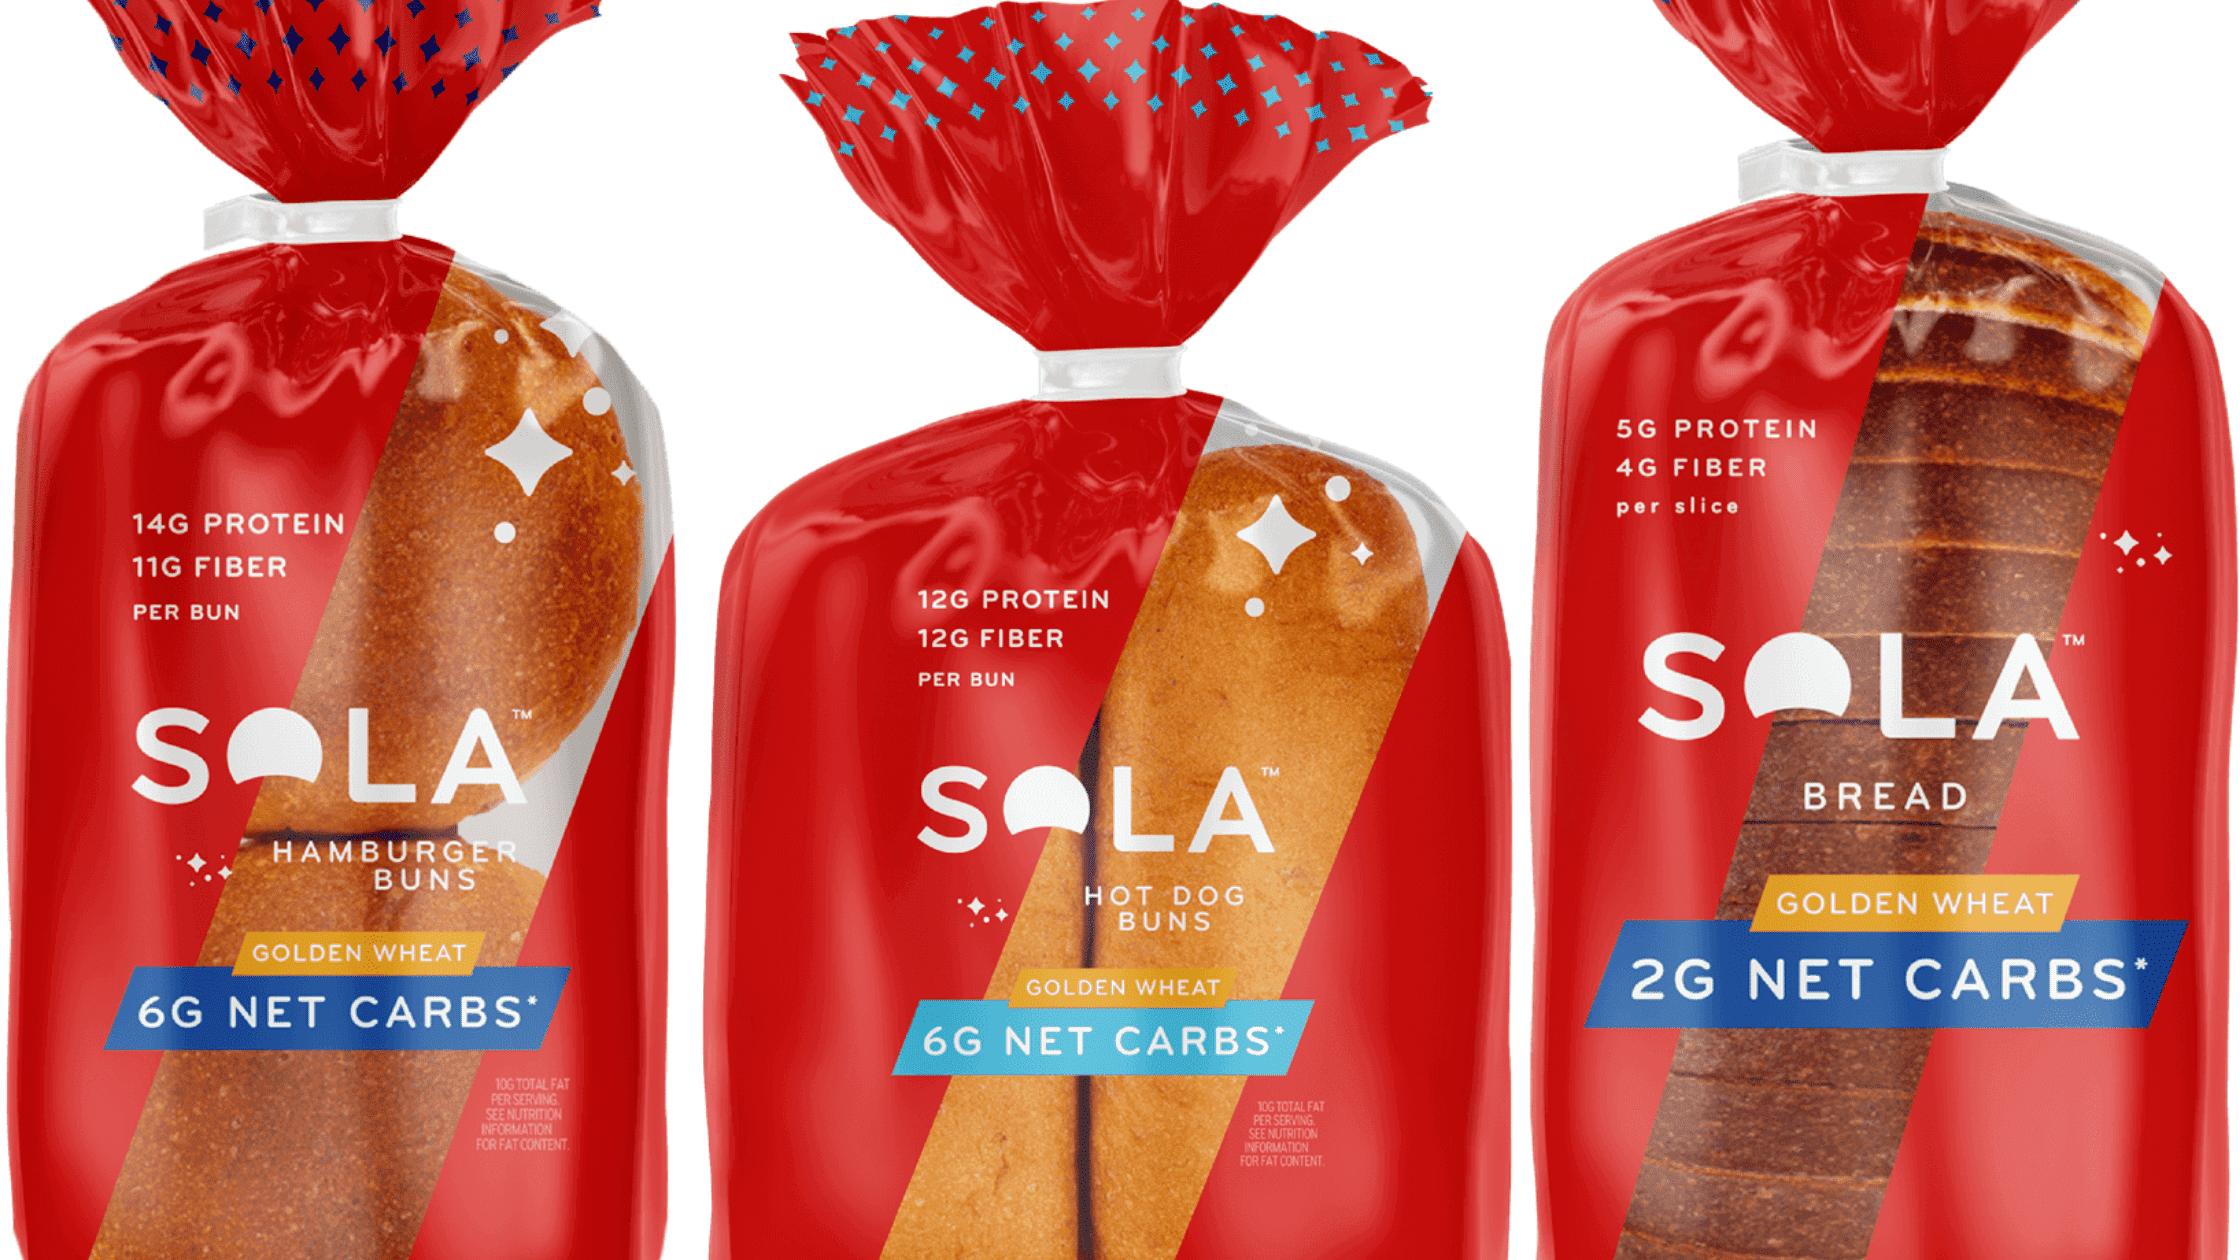 Sola Keto Bread Review